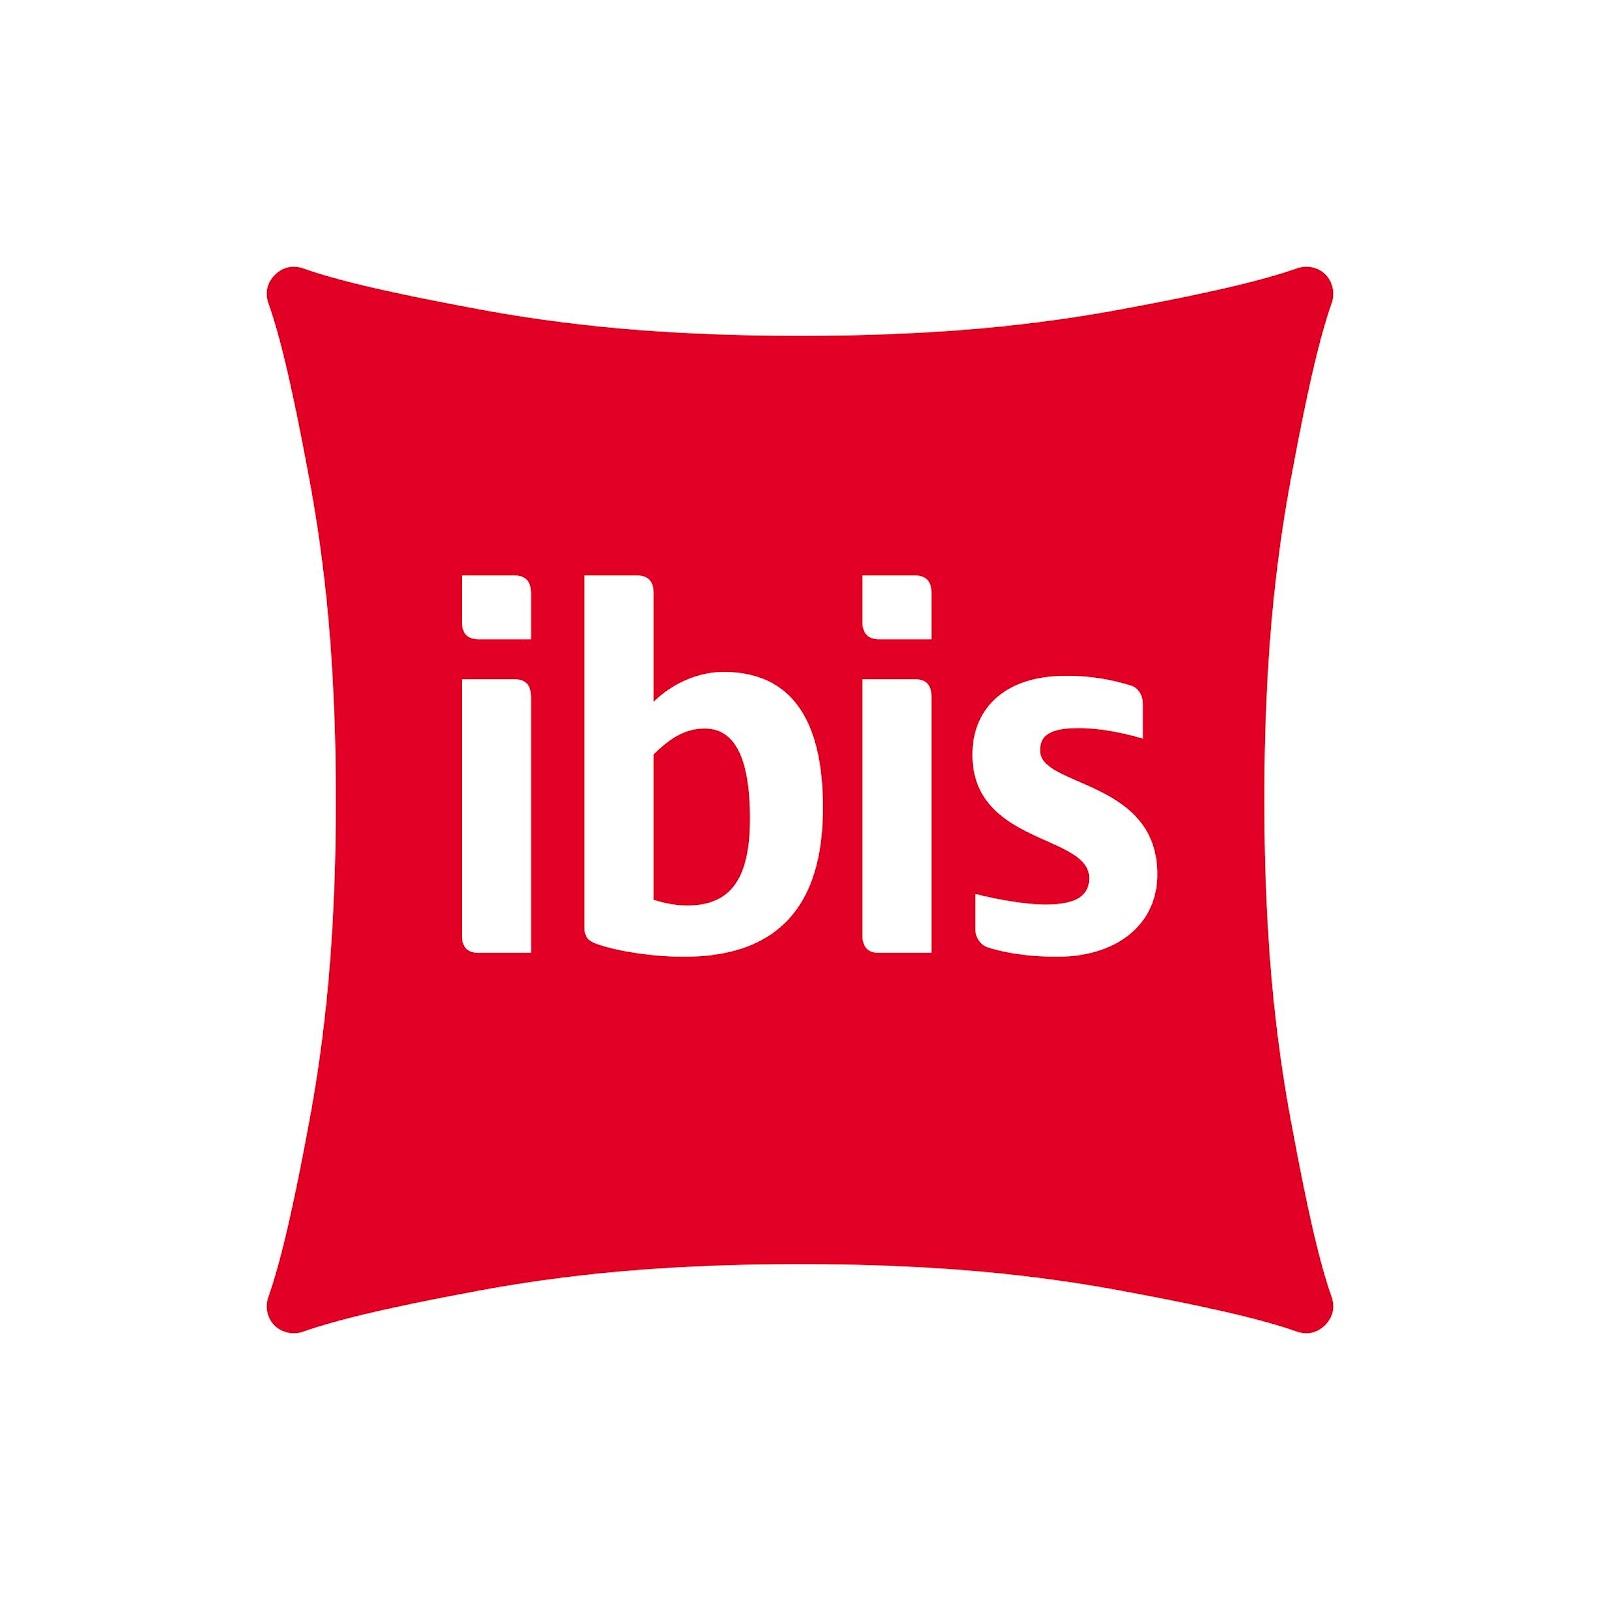 D:\Handovers\Amisha Handover\Logos\Logo_ibis_RGB.jpg